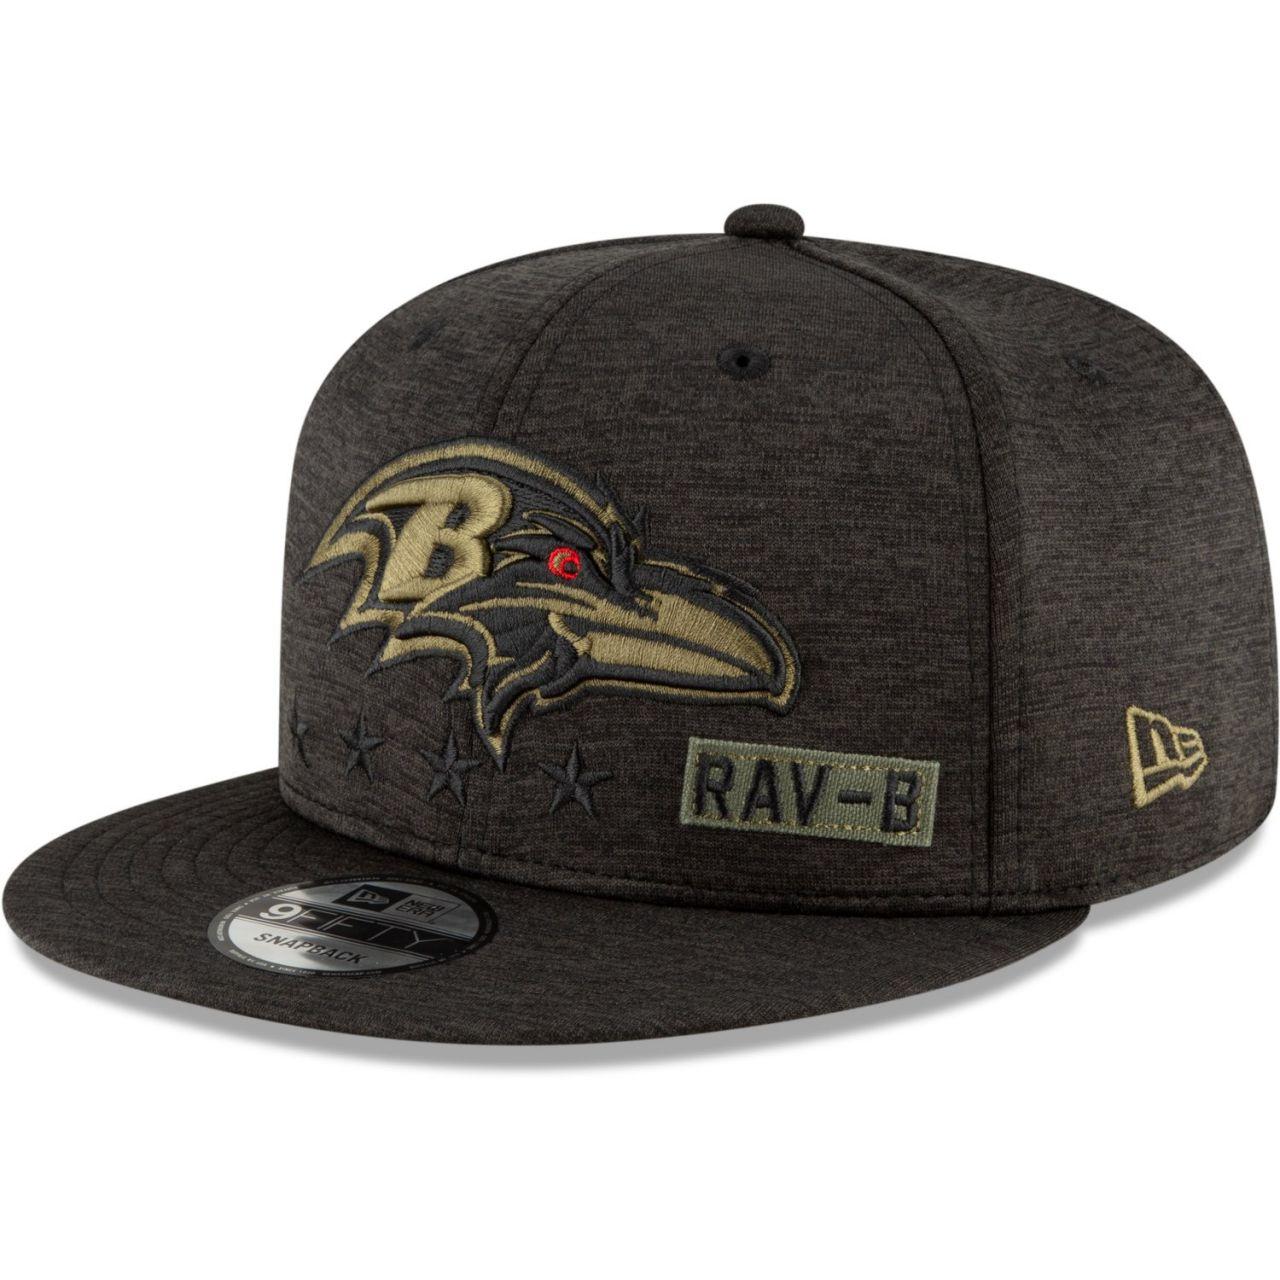 amfoo - New Era 9FIFTY Cap Salute to Service Baltimore Ravens